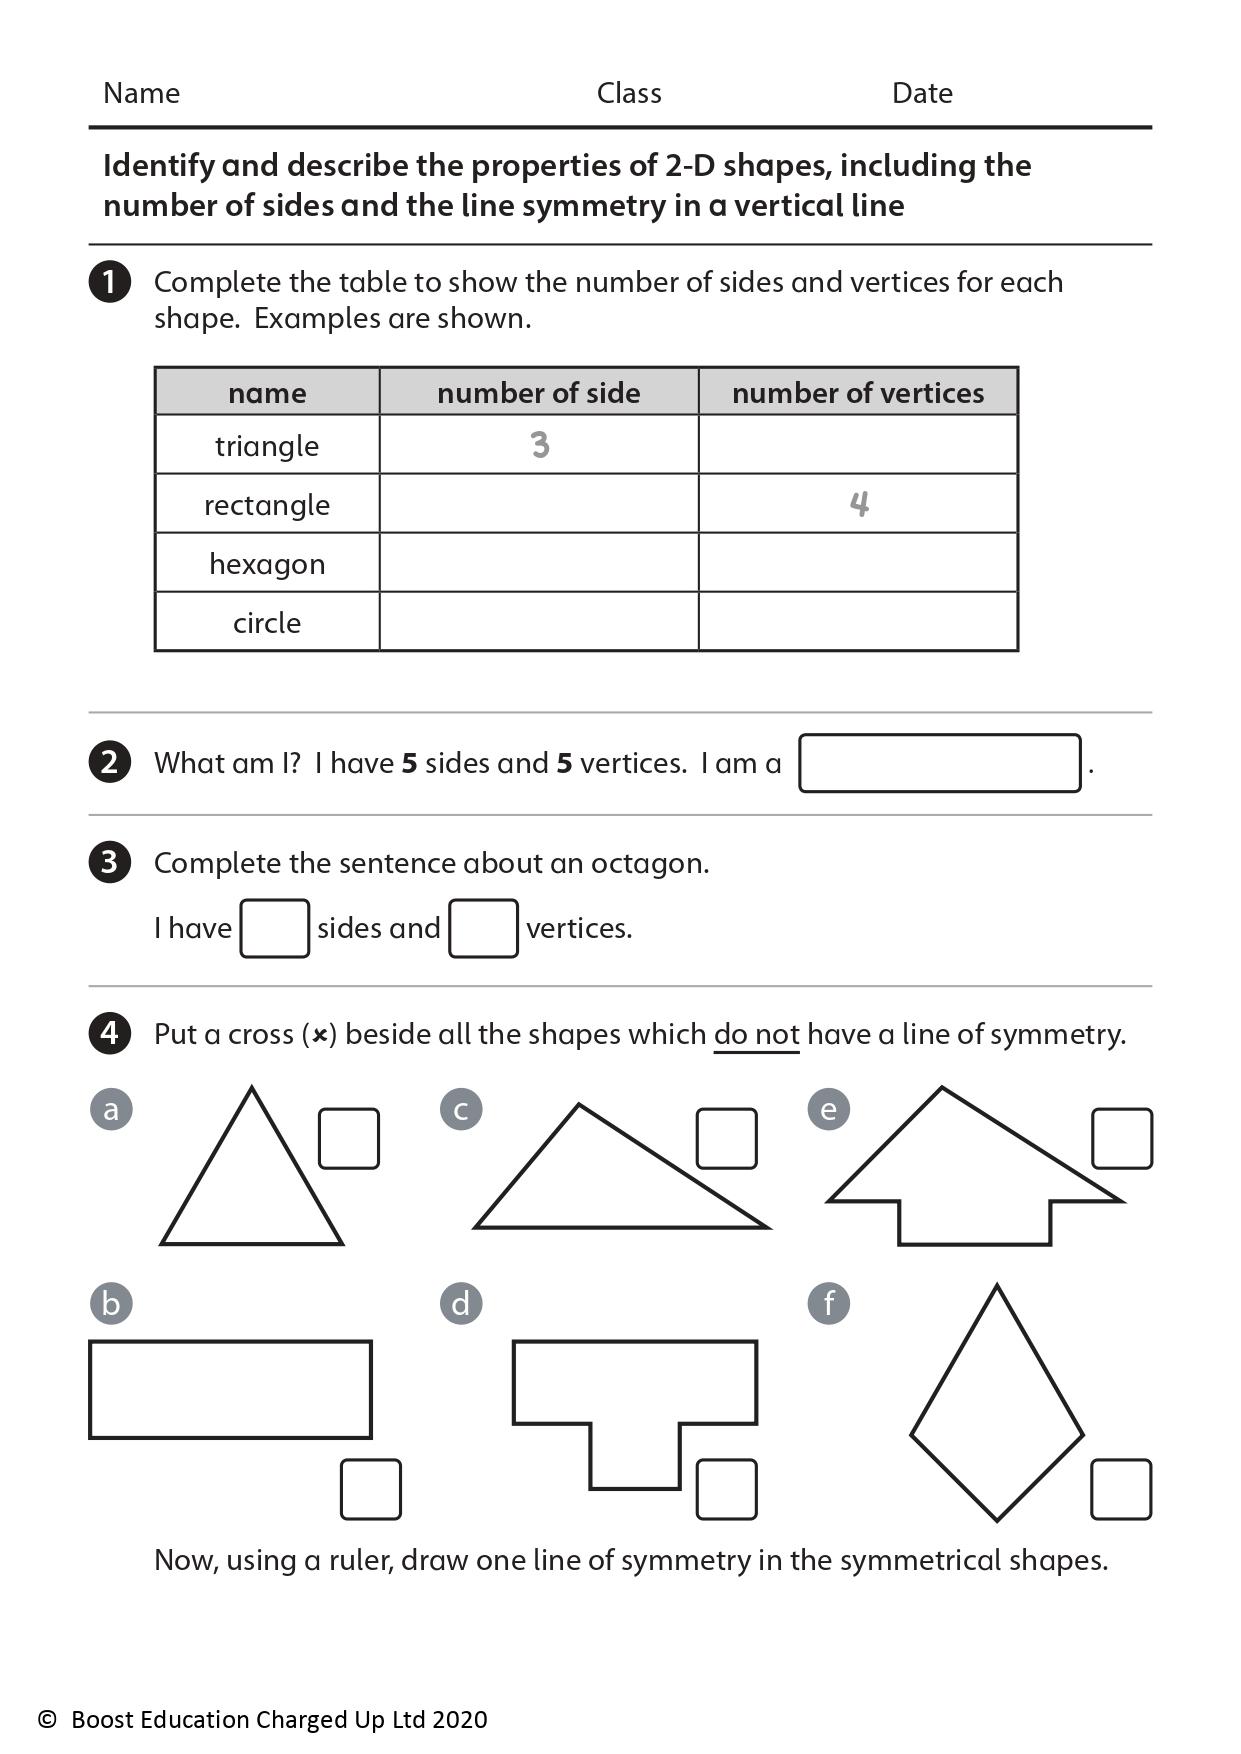 Free Downloadable Worksheets Educational Worksheets For Children